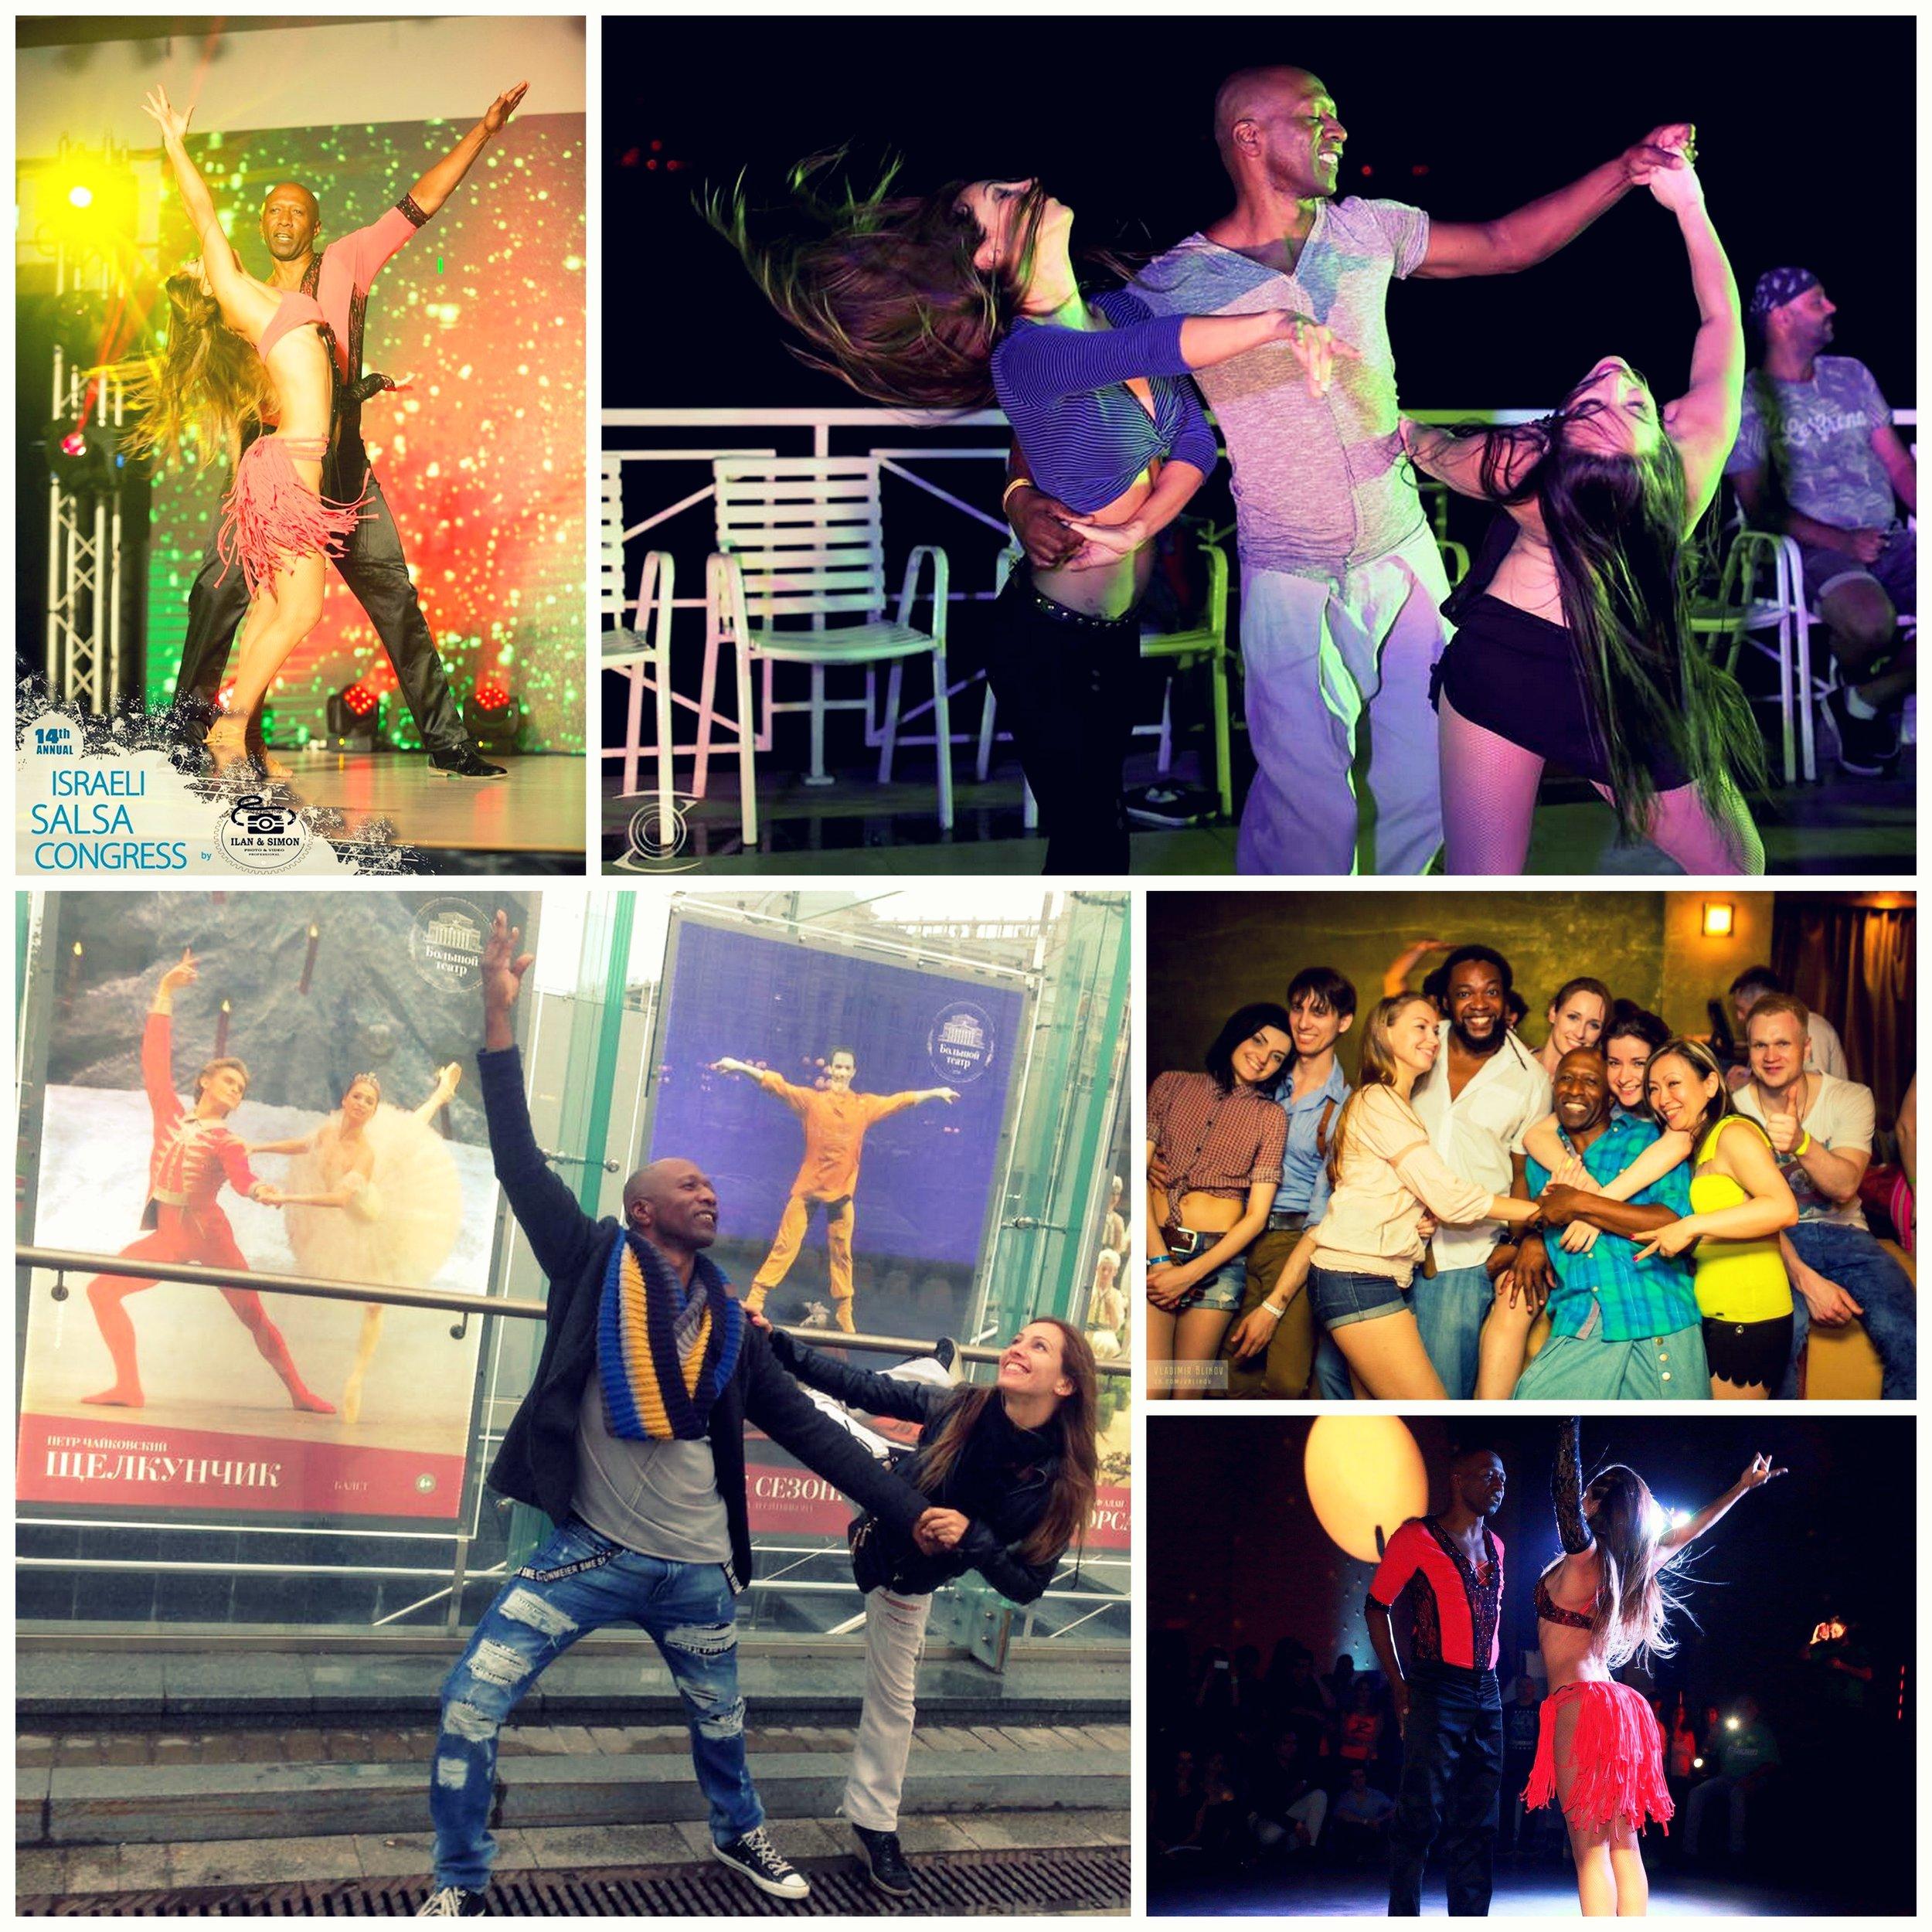 Photos by: Latino Del Mundo Productions, ZL Photos, Maria Cristiani, Moscow Zouk Congress, Buenos Aires Like Festival